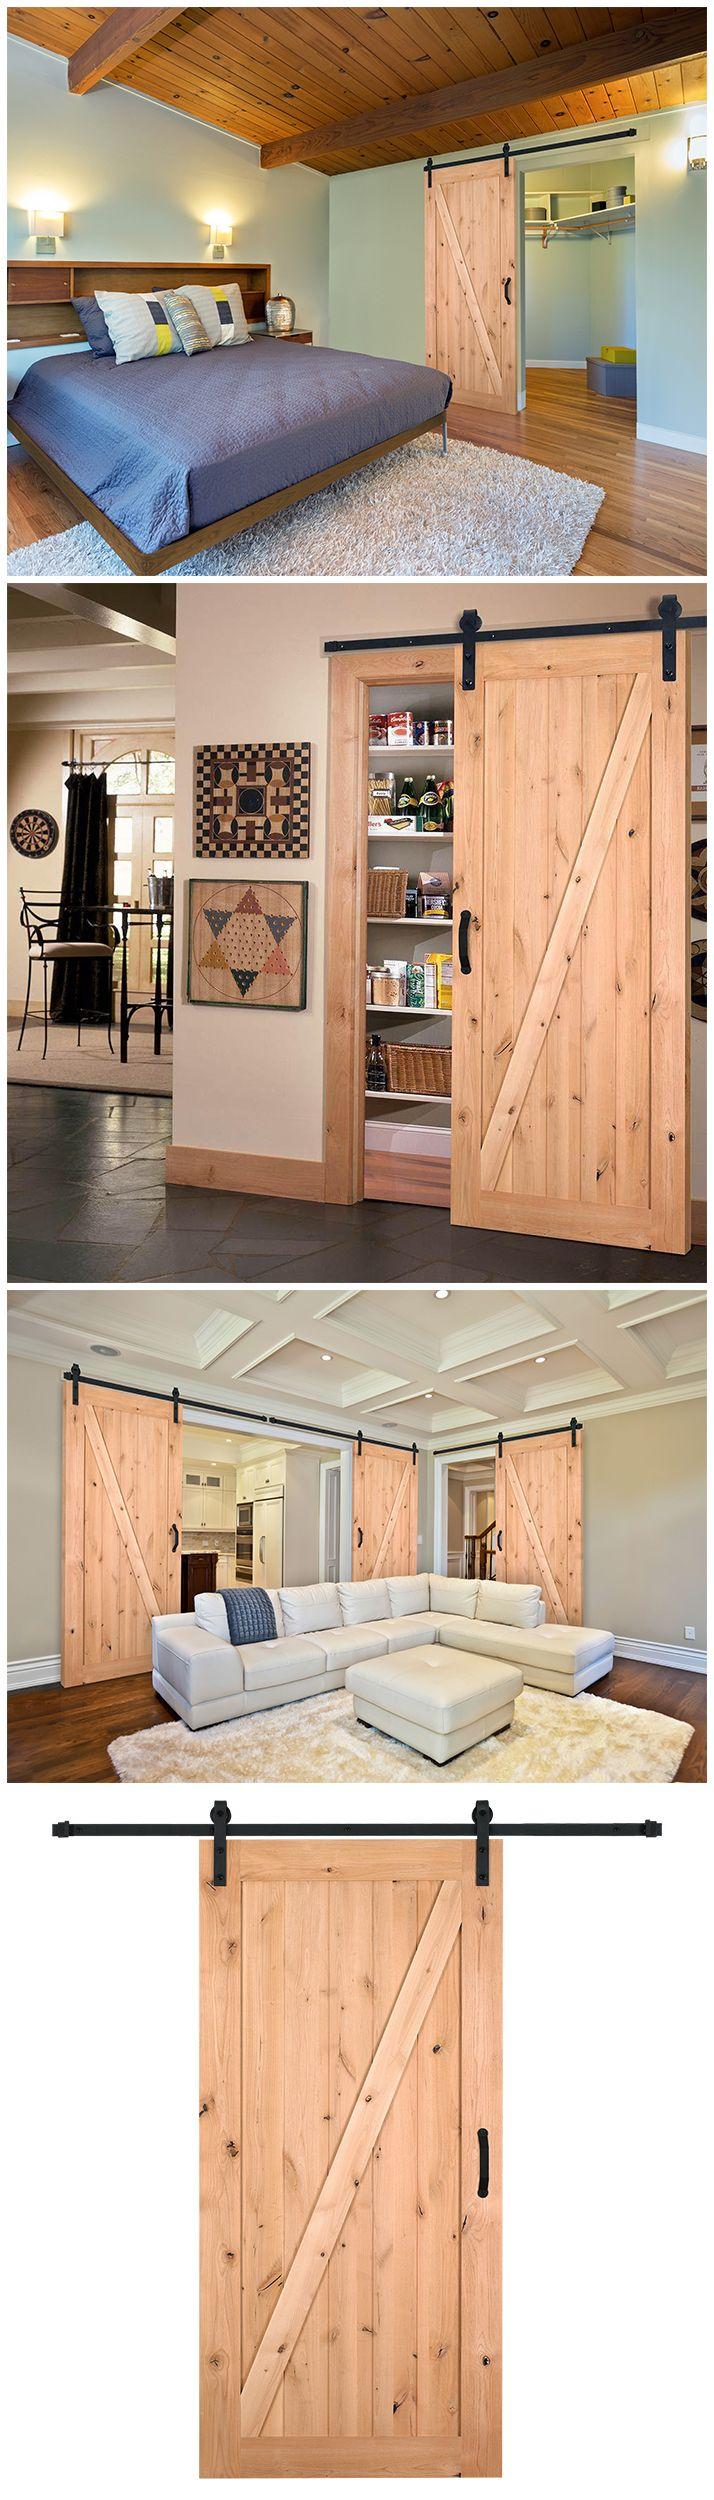 Masonite in x in zbar knotty alder wood interior barn door